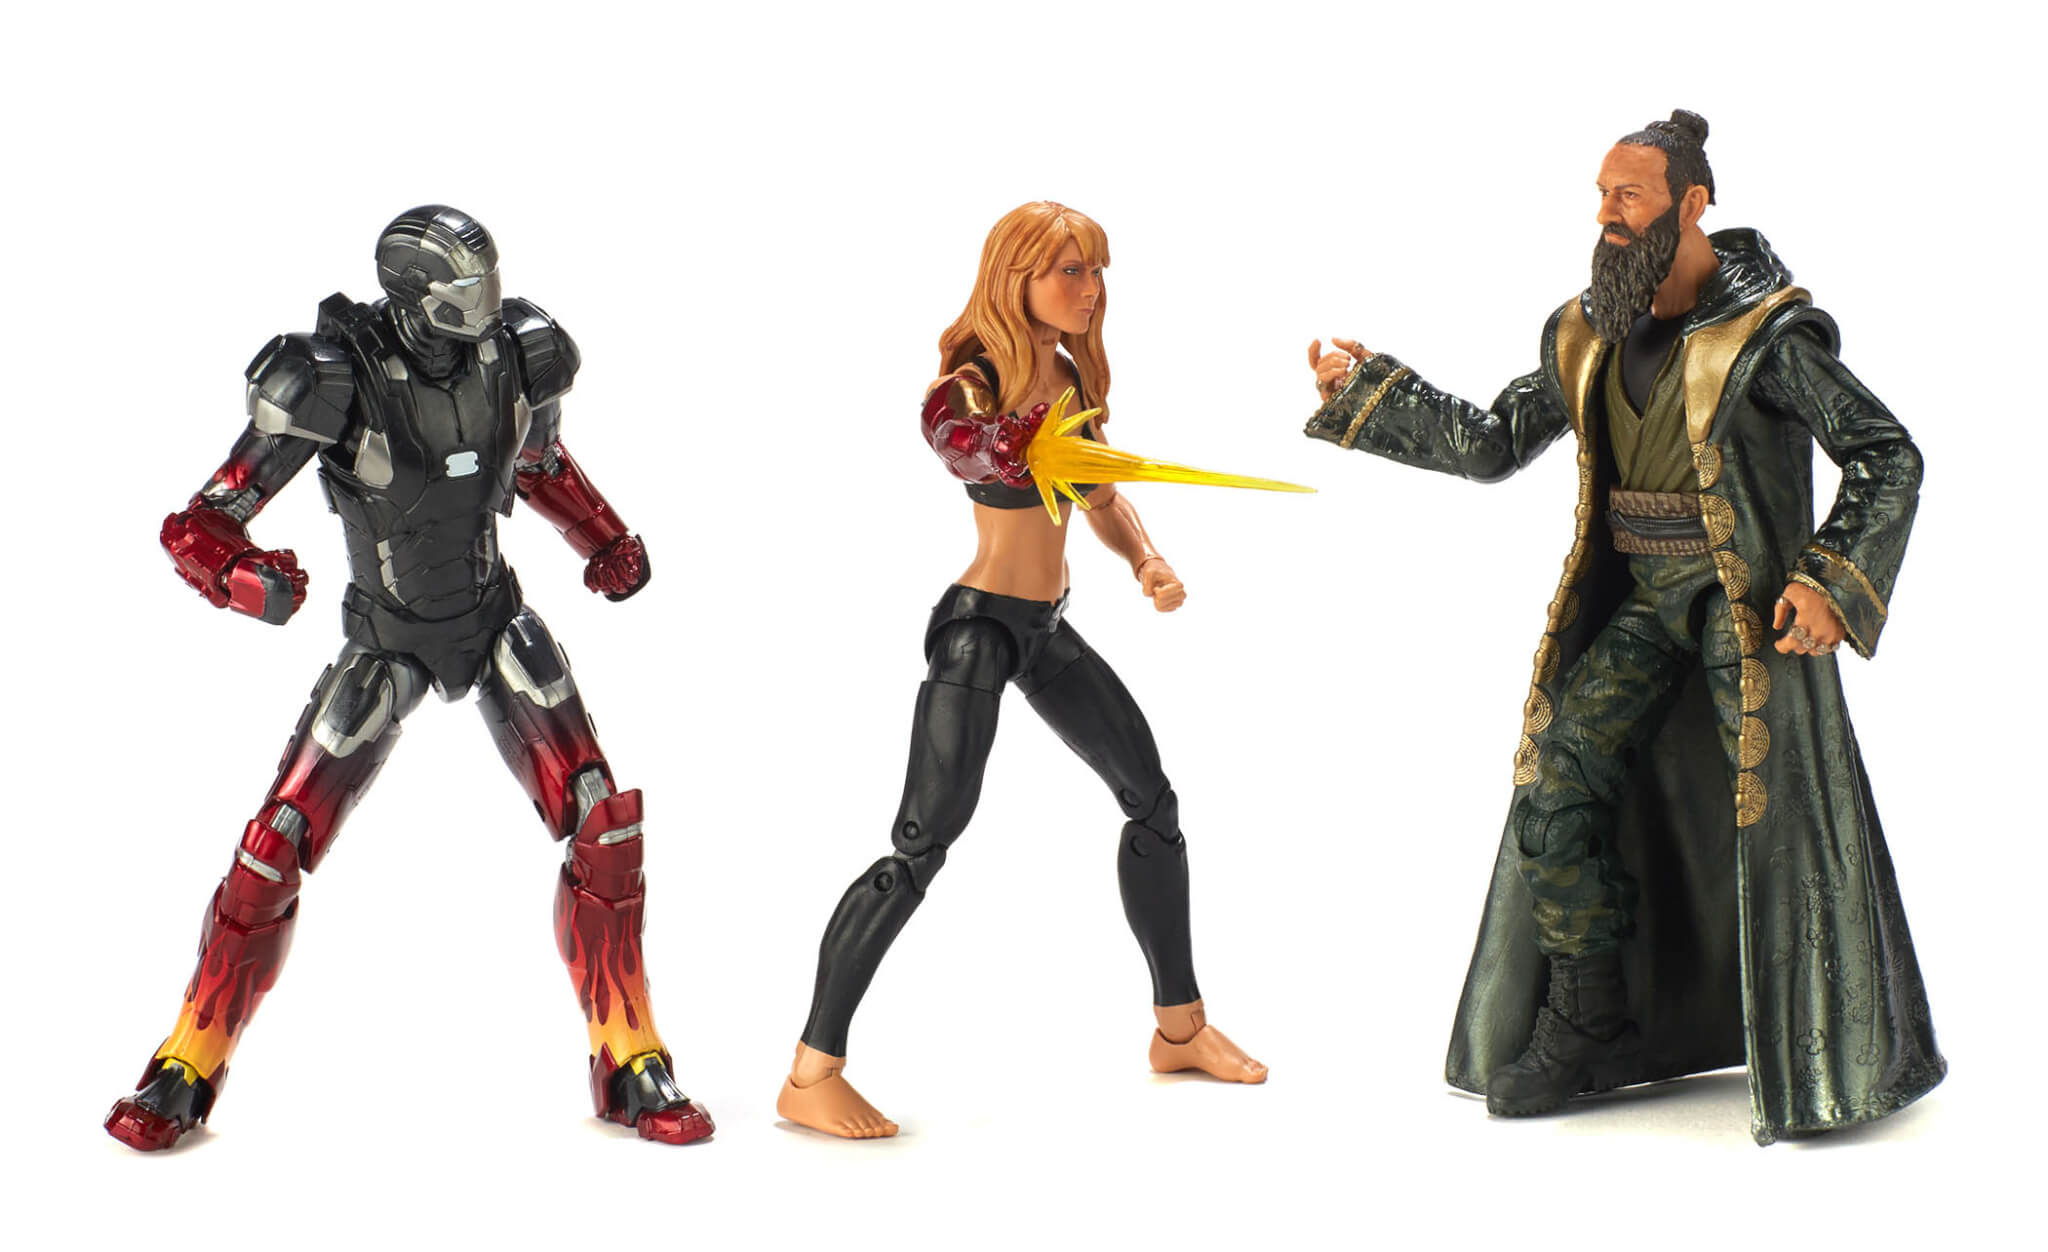 Hasbro 2018 MCU Iron Man Pepper Potts and the Mandarin 3-pack